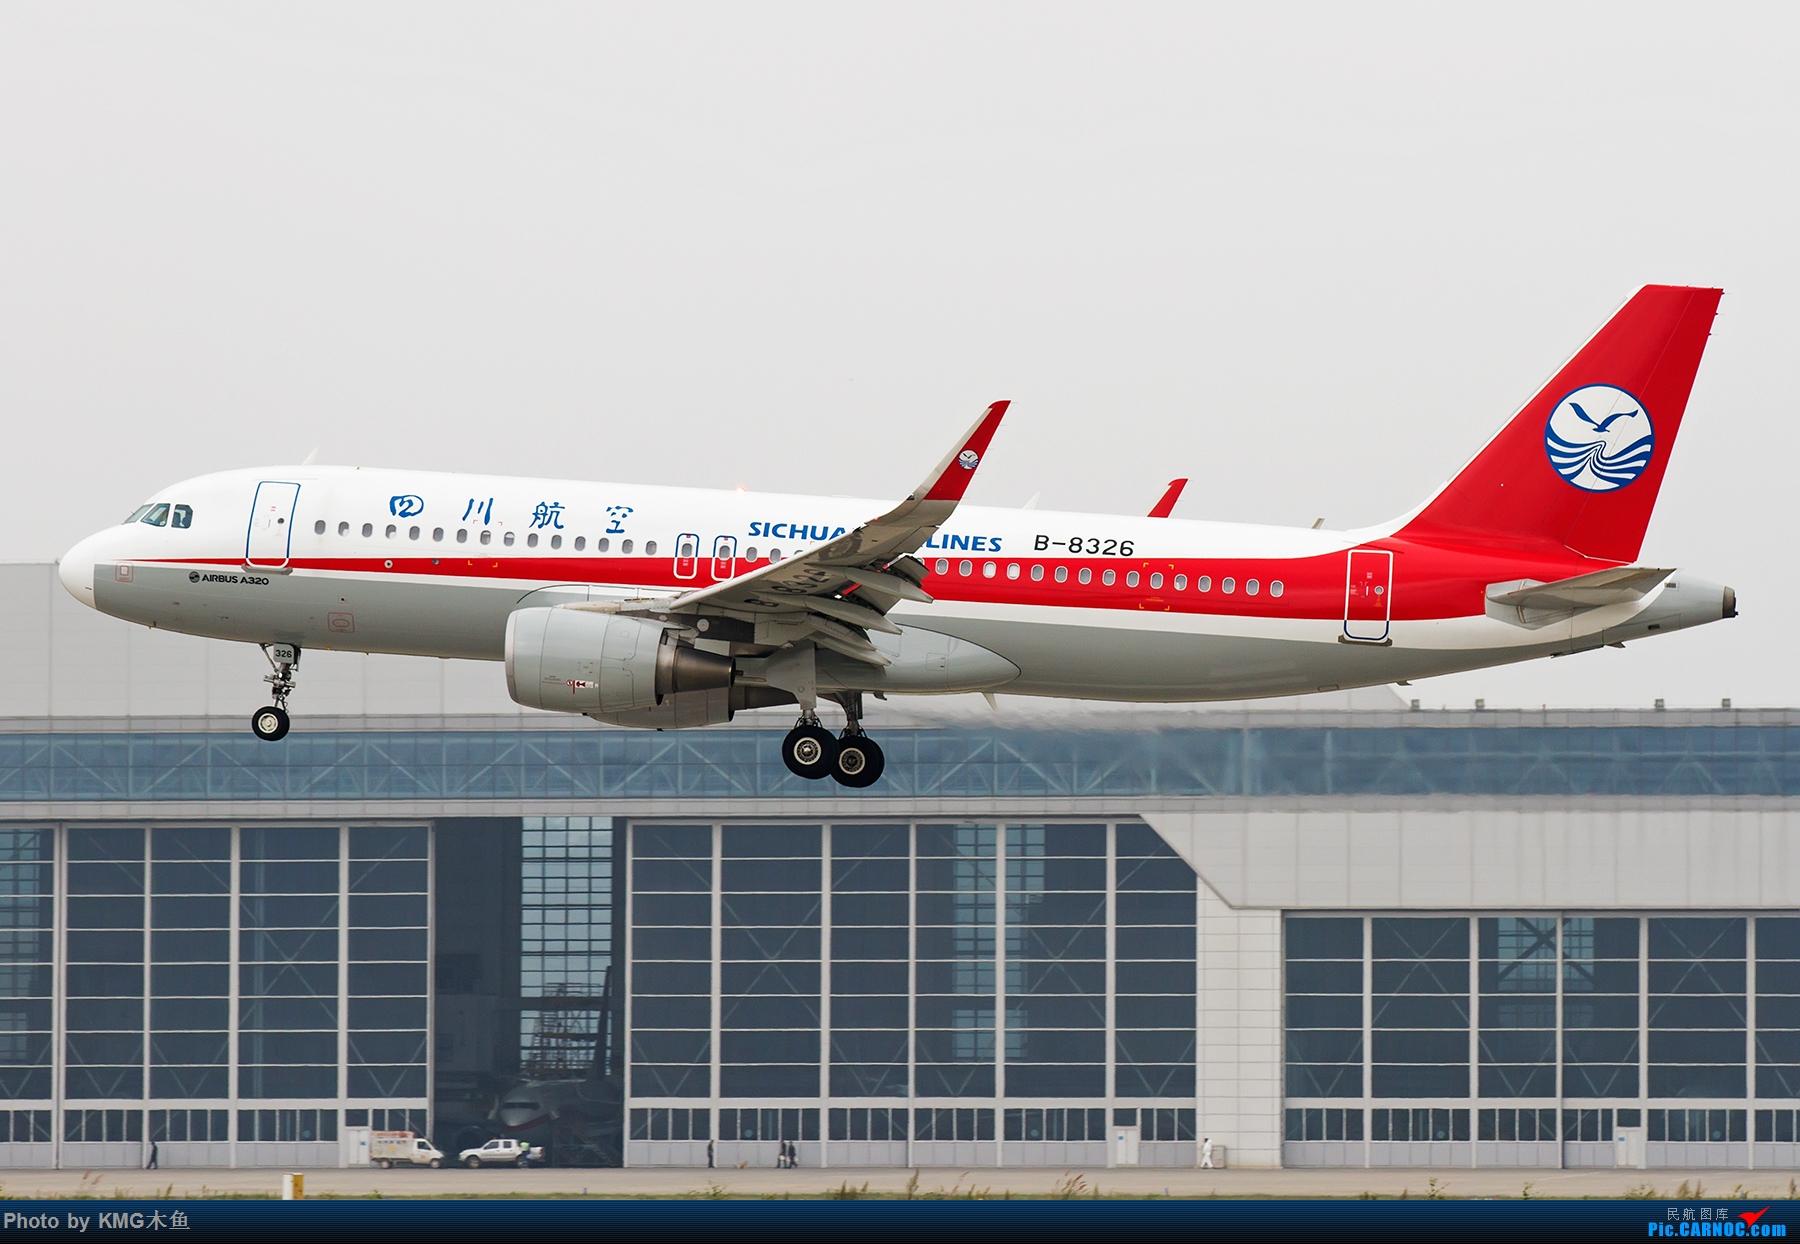 Re:[原创]【C47运输机KMG木鱼木有拍到】烂天有好货,好货在内场,嘻嘻 AIRBUS A320-200 B-8326 中国昆明长水国际机场